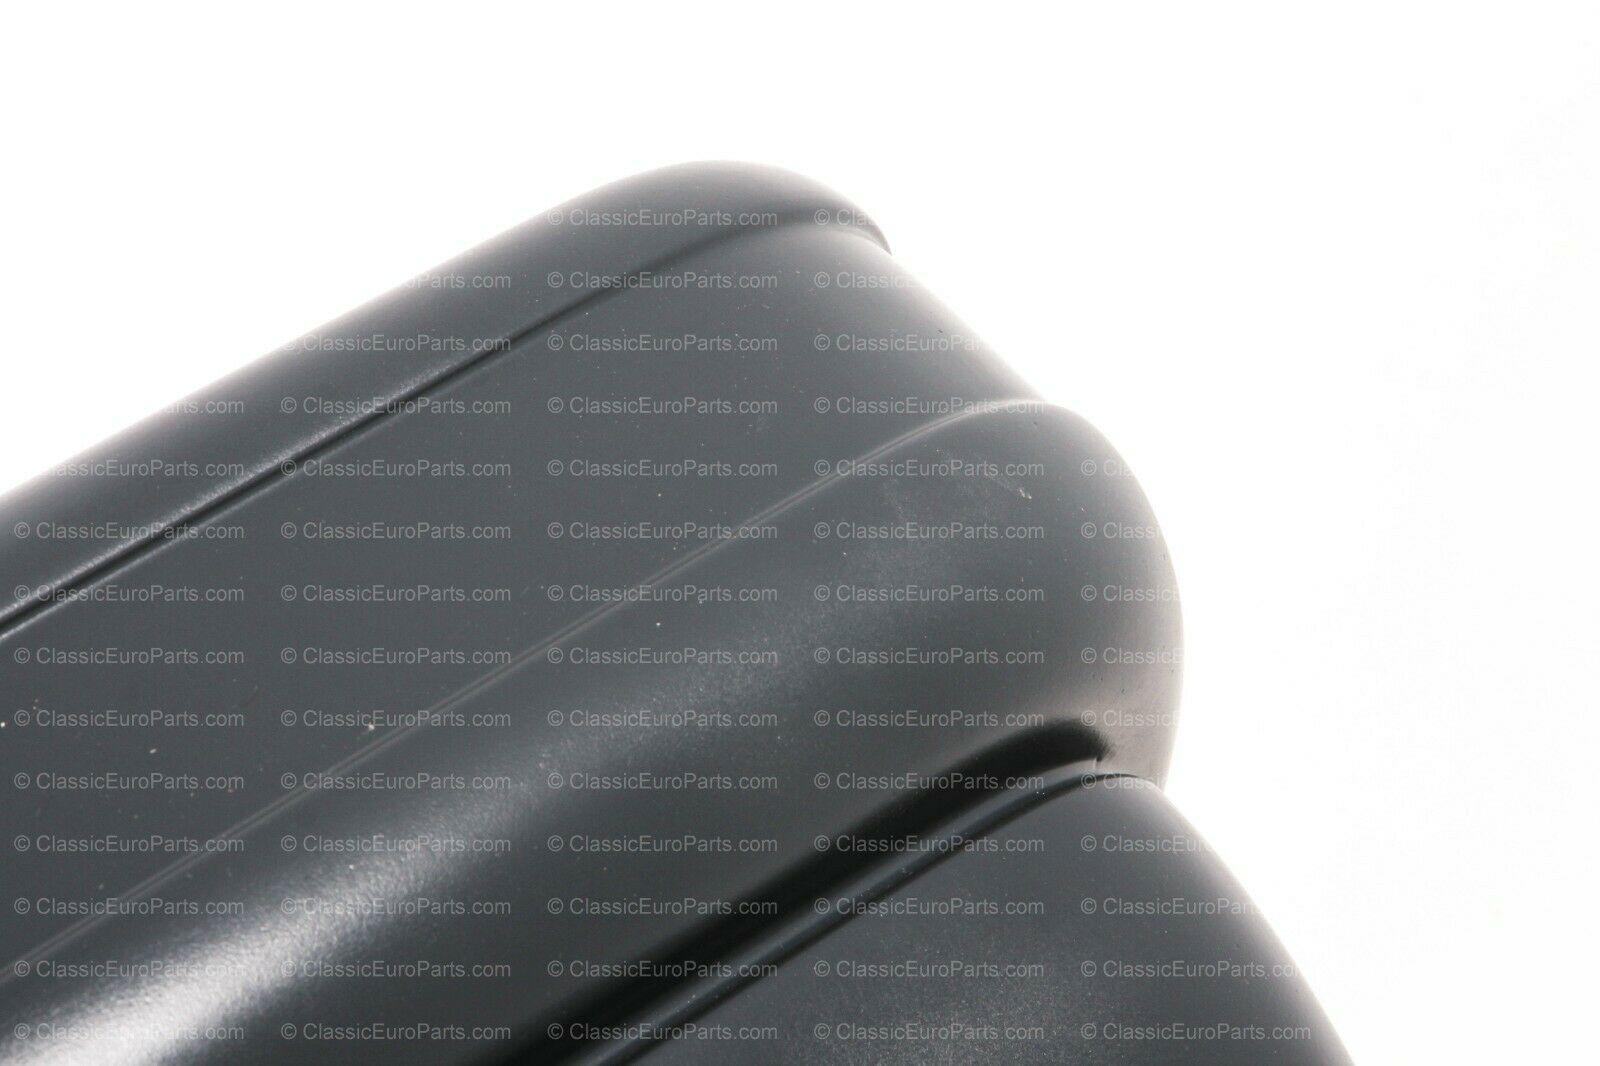 Honda Parts Cheap >> Rear bumper for E30 Mtech 2 – ClassicEuroParts